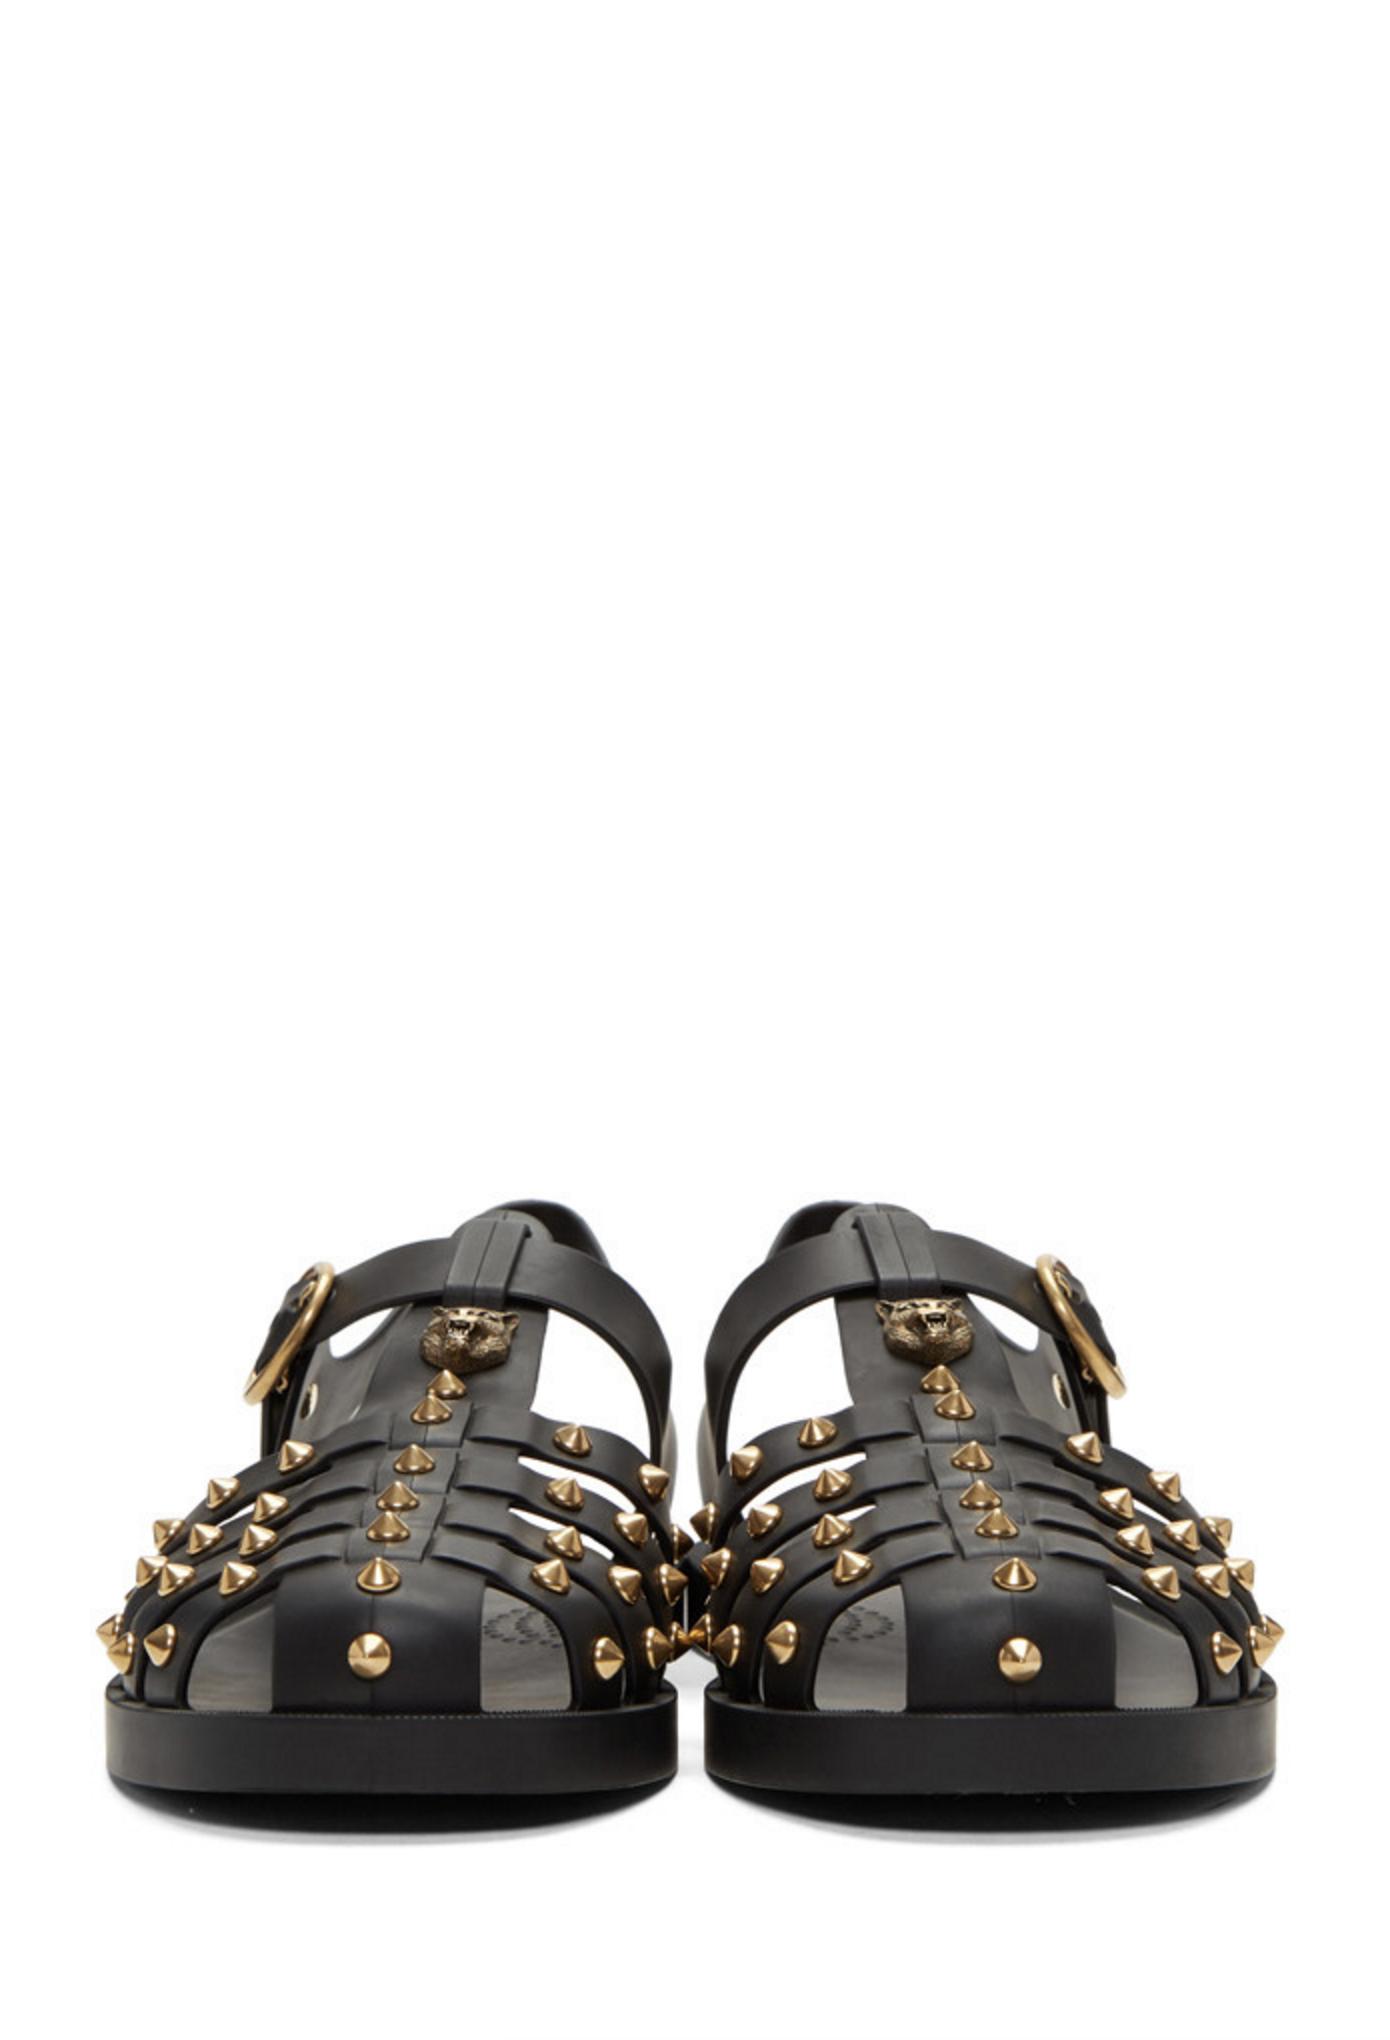 Rubber Sandal Spring/summerGucci GGco0ibQ